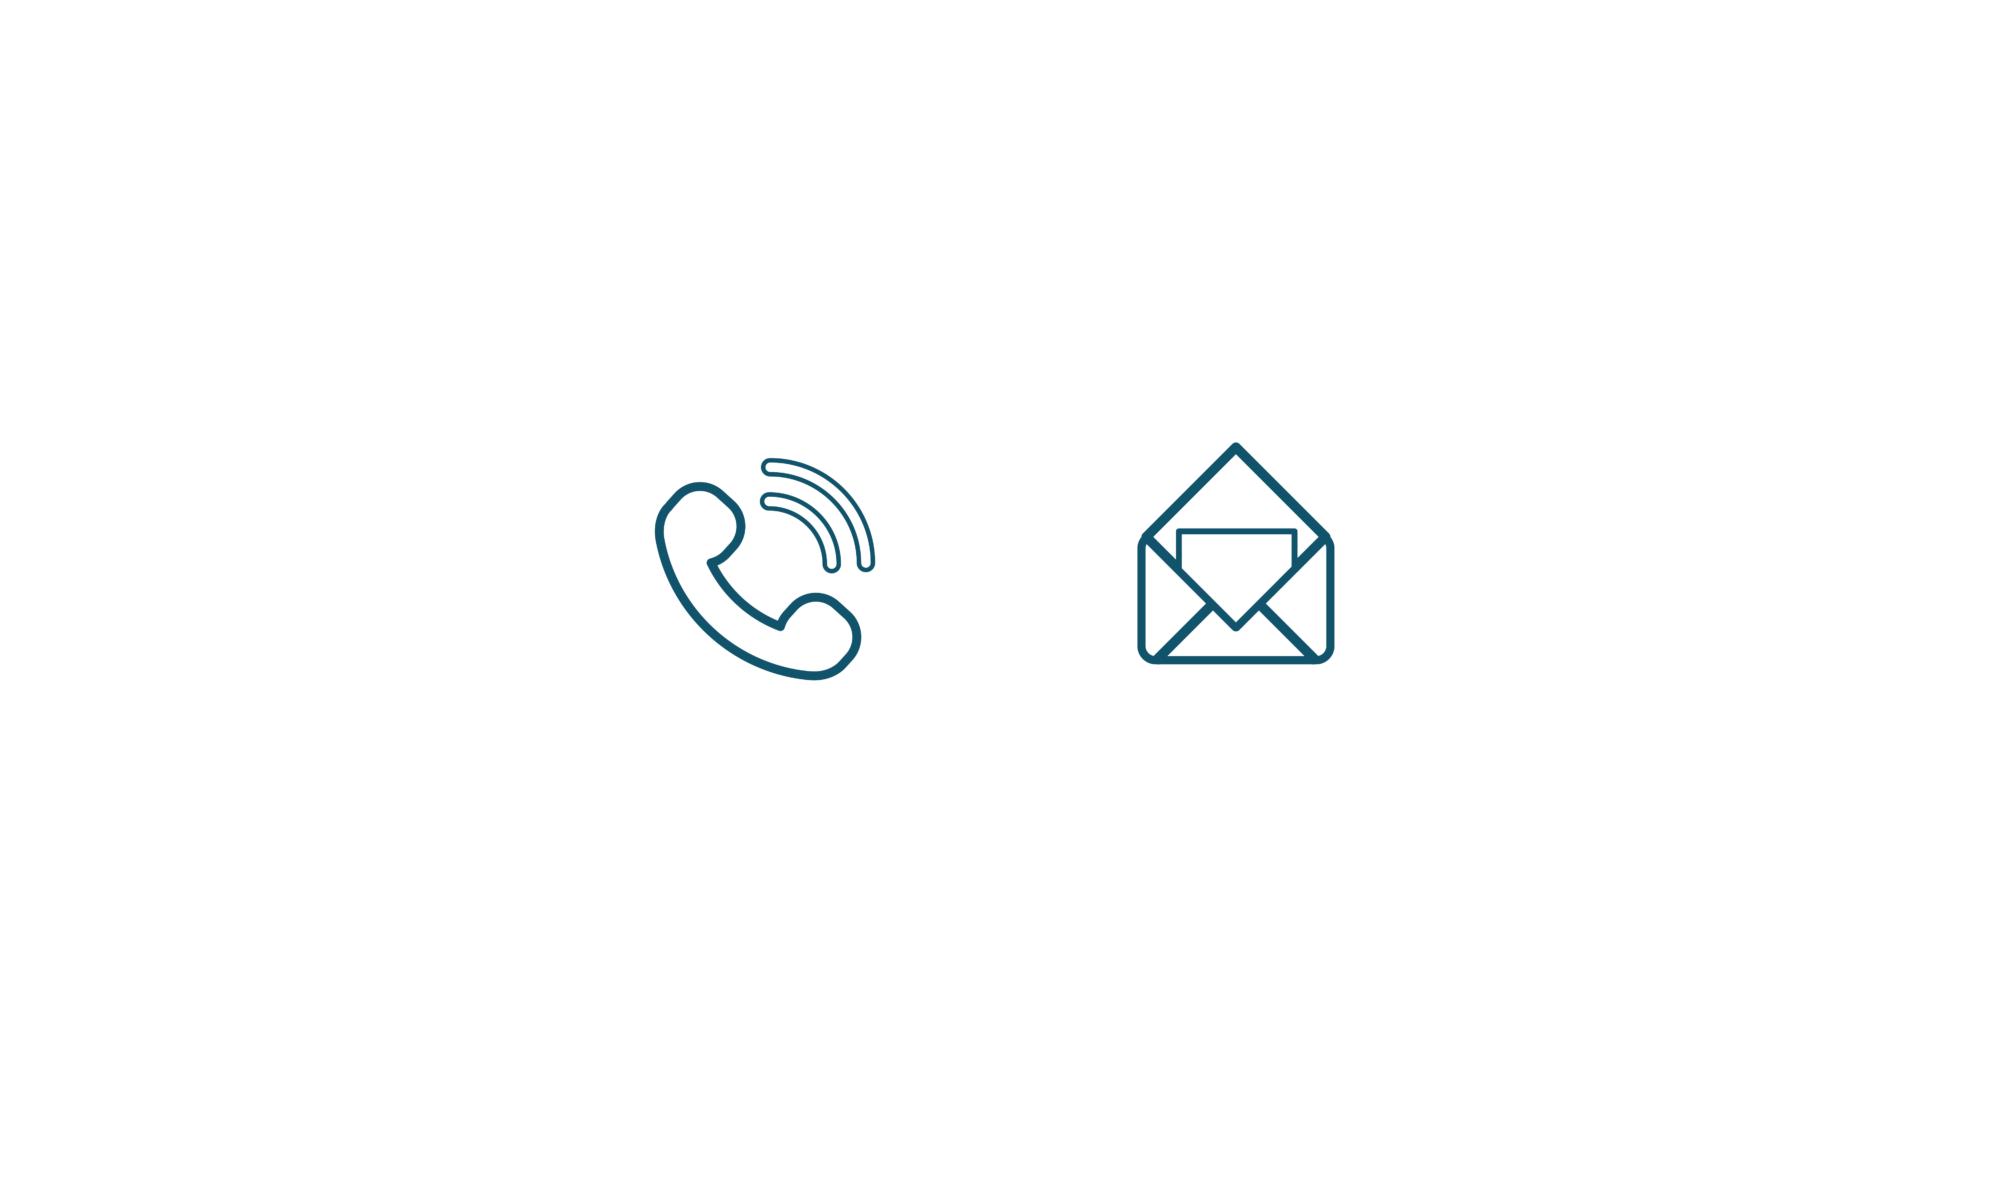 Contact par telephone mail